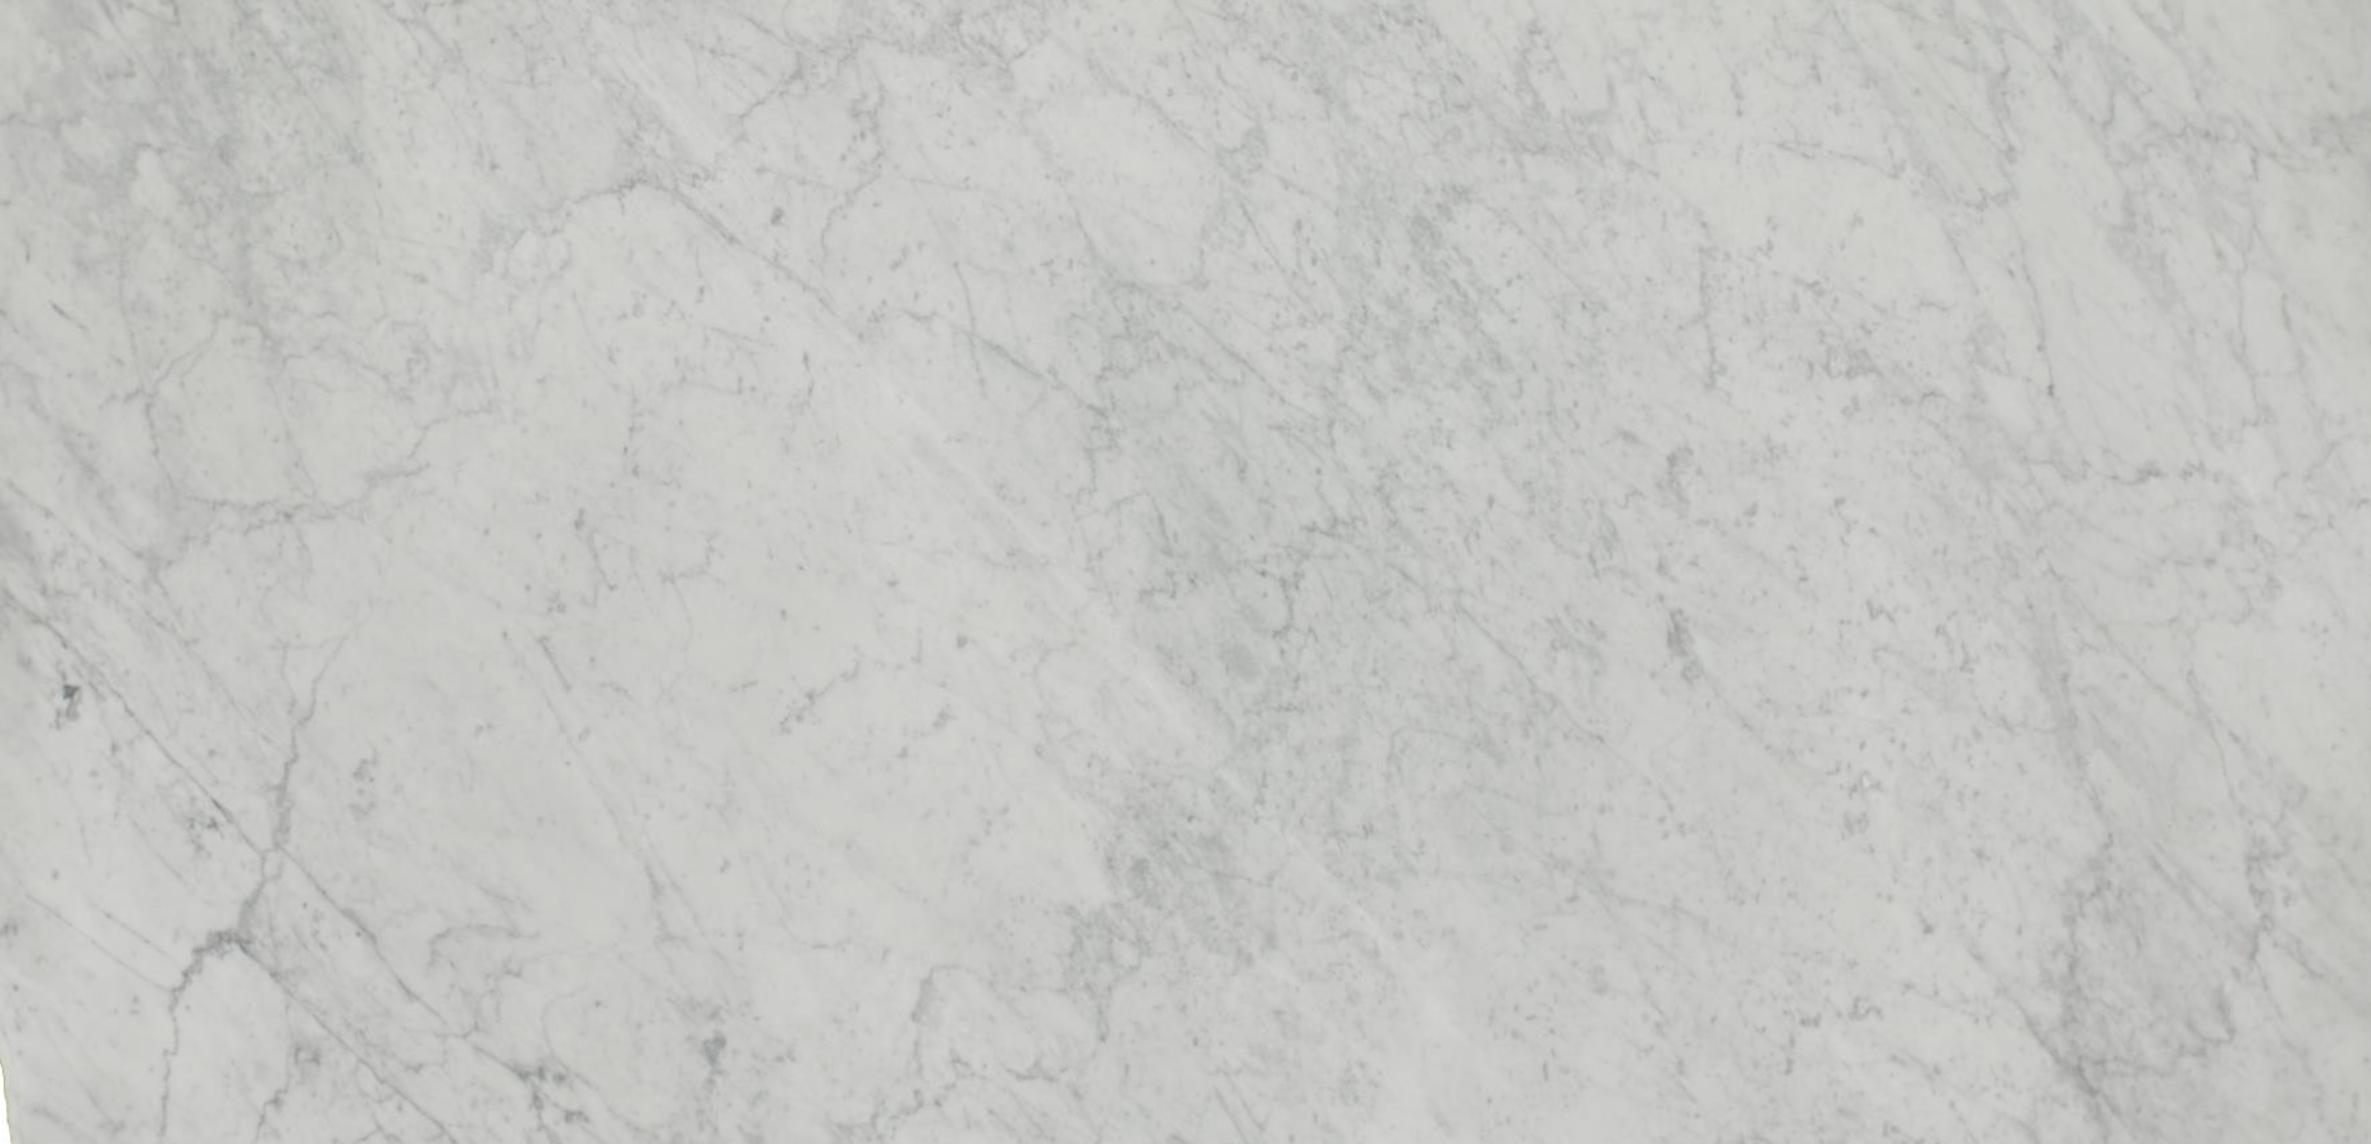 MARBLE | WHITE CARRERA CLASSIC